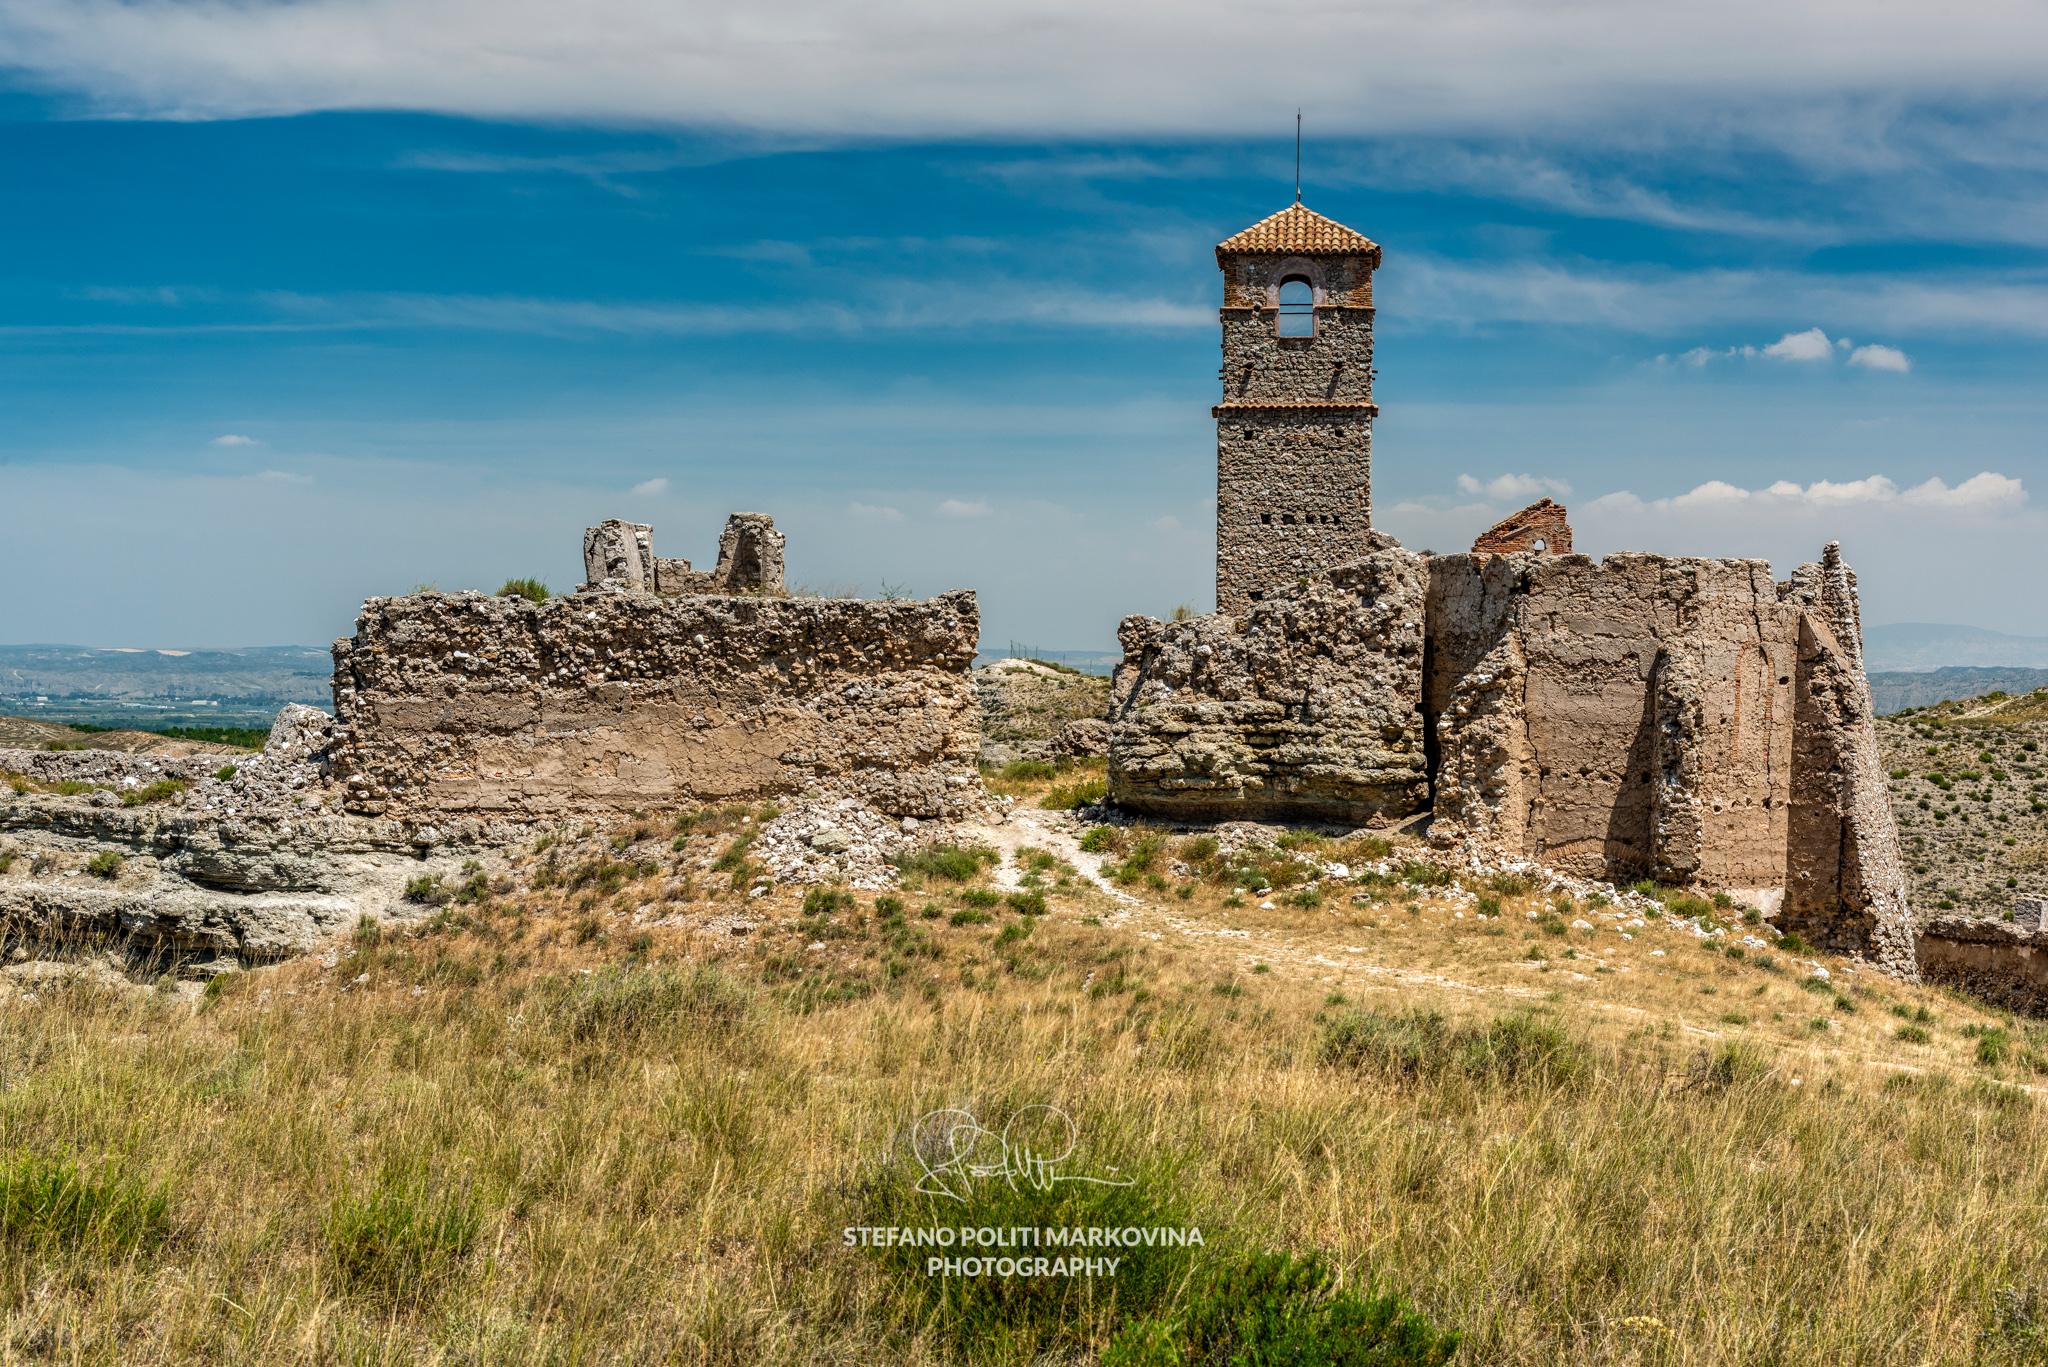 Roden, Aragon, Spain